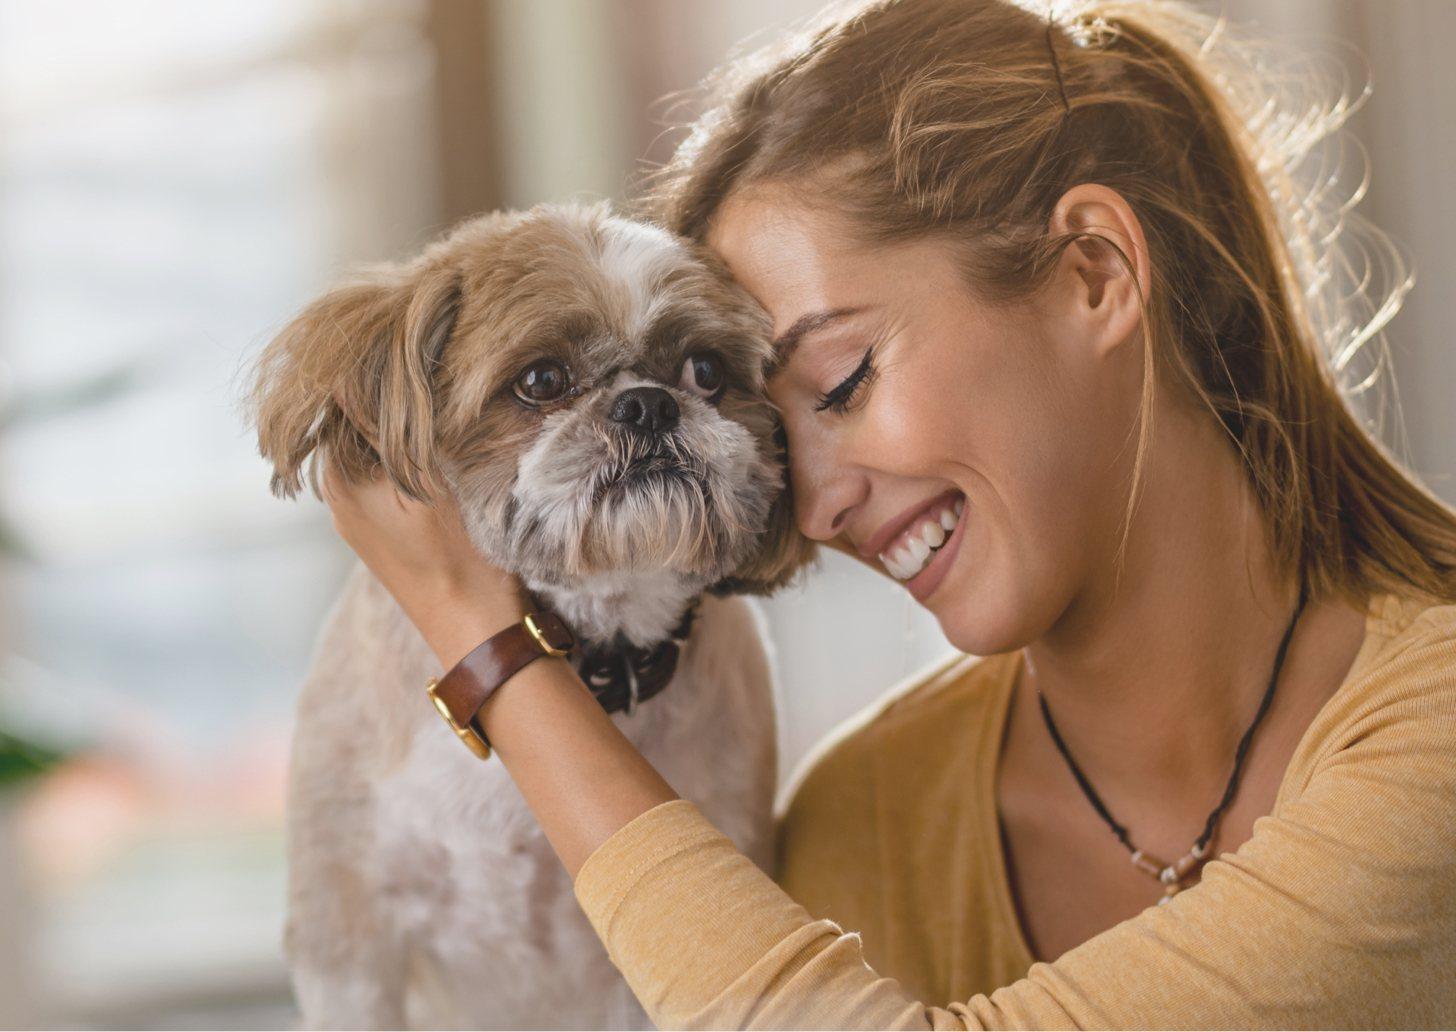 Woman hugging a small dog